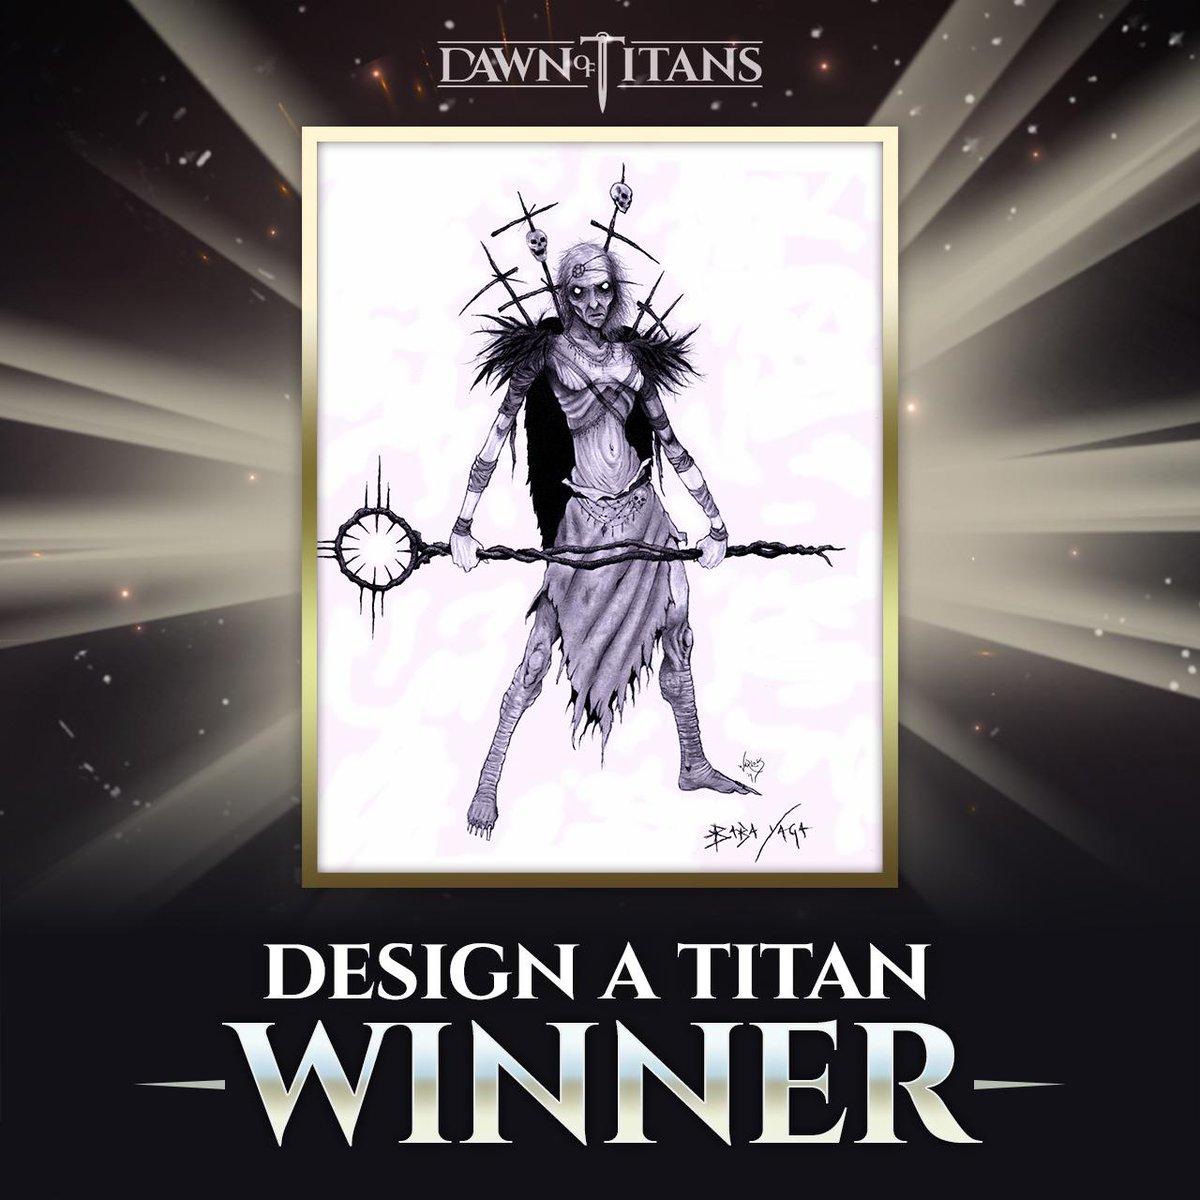 Dawn of Titans (@DawnOfTitans) | Twitter